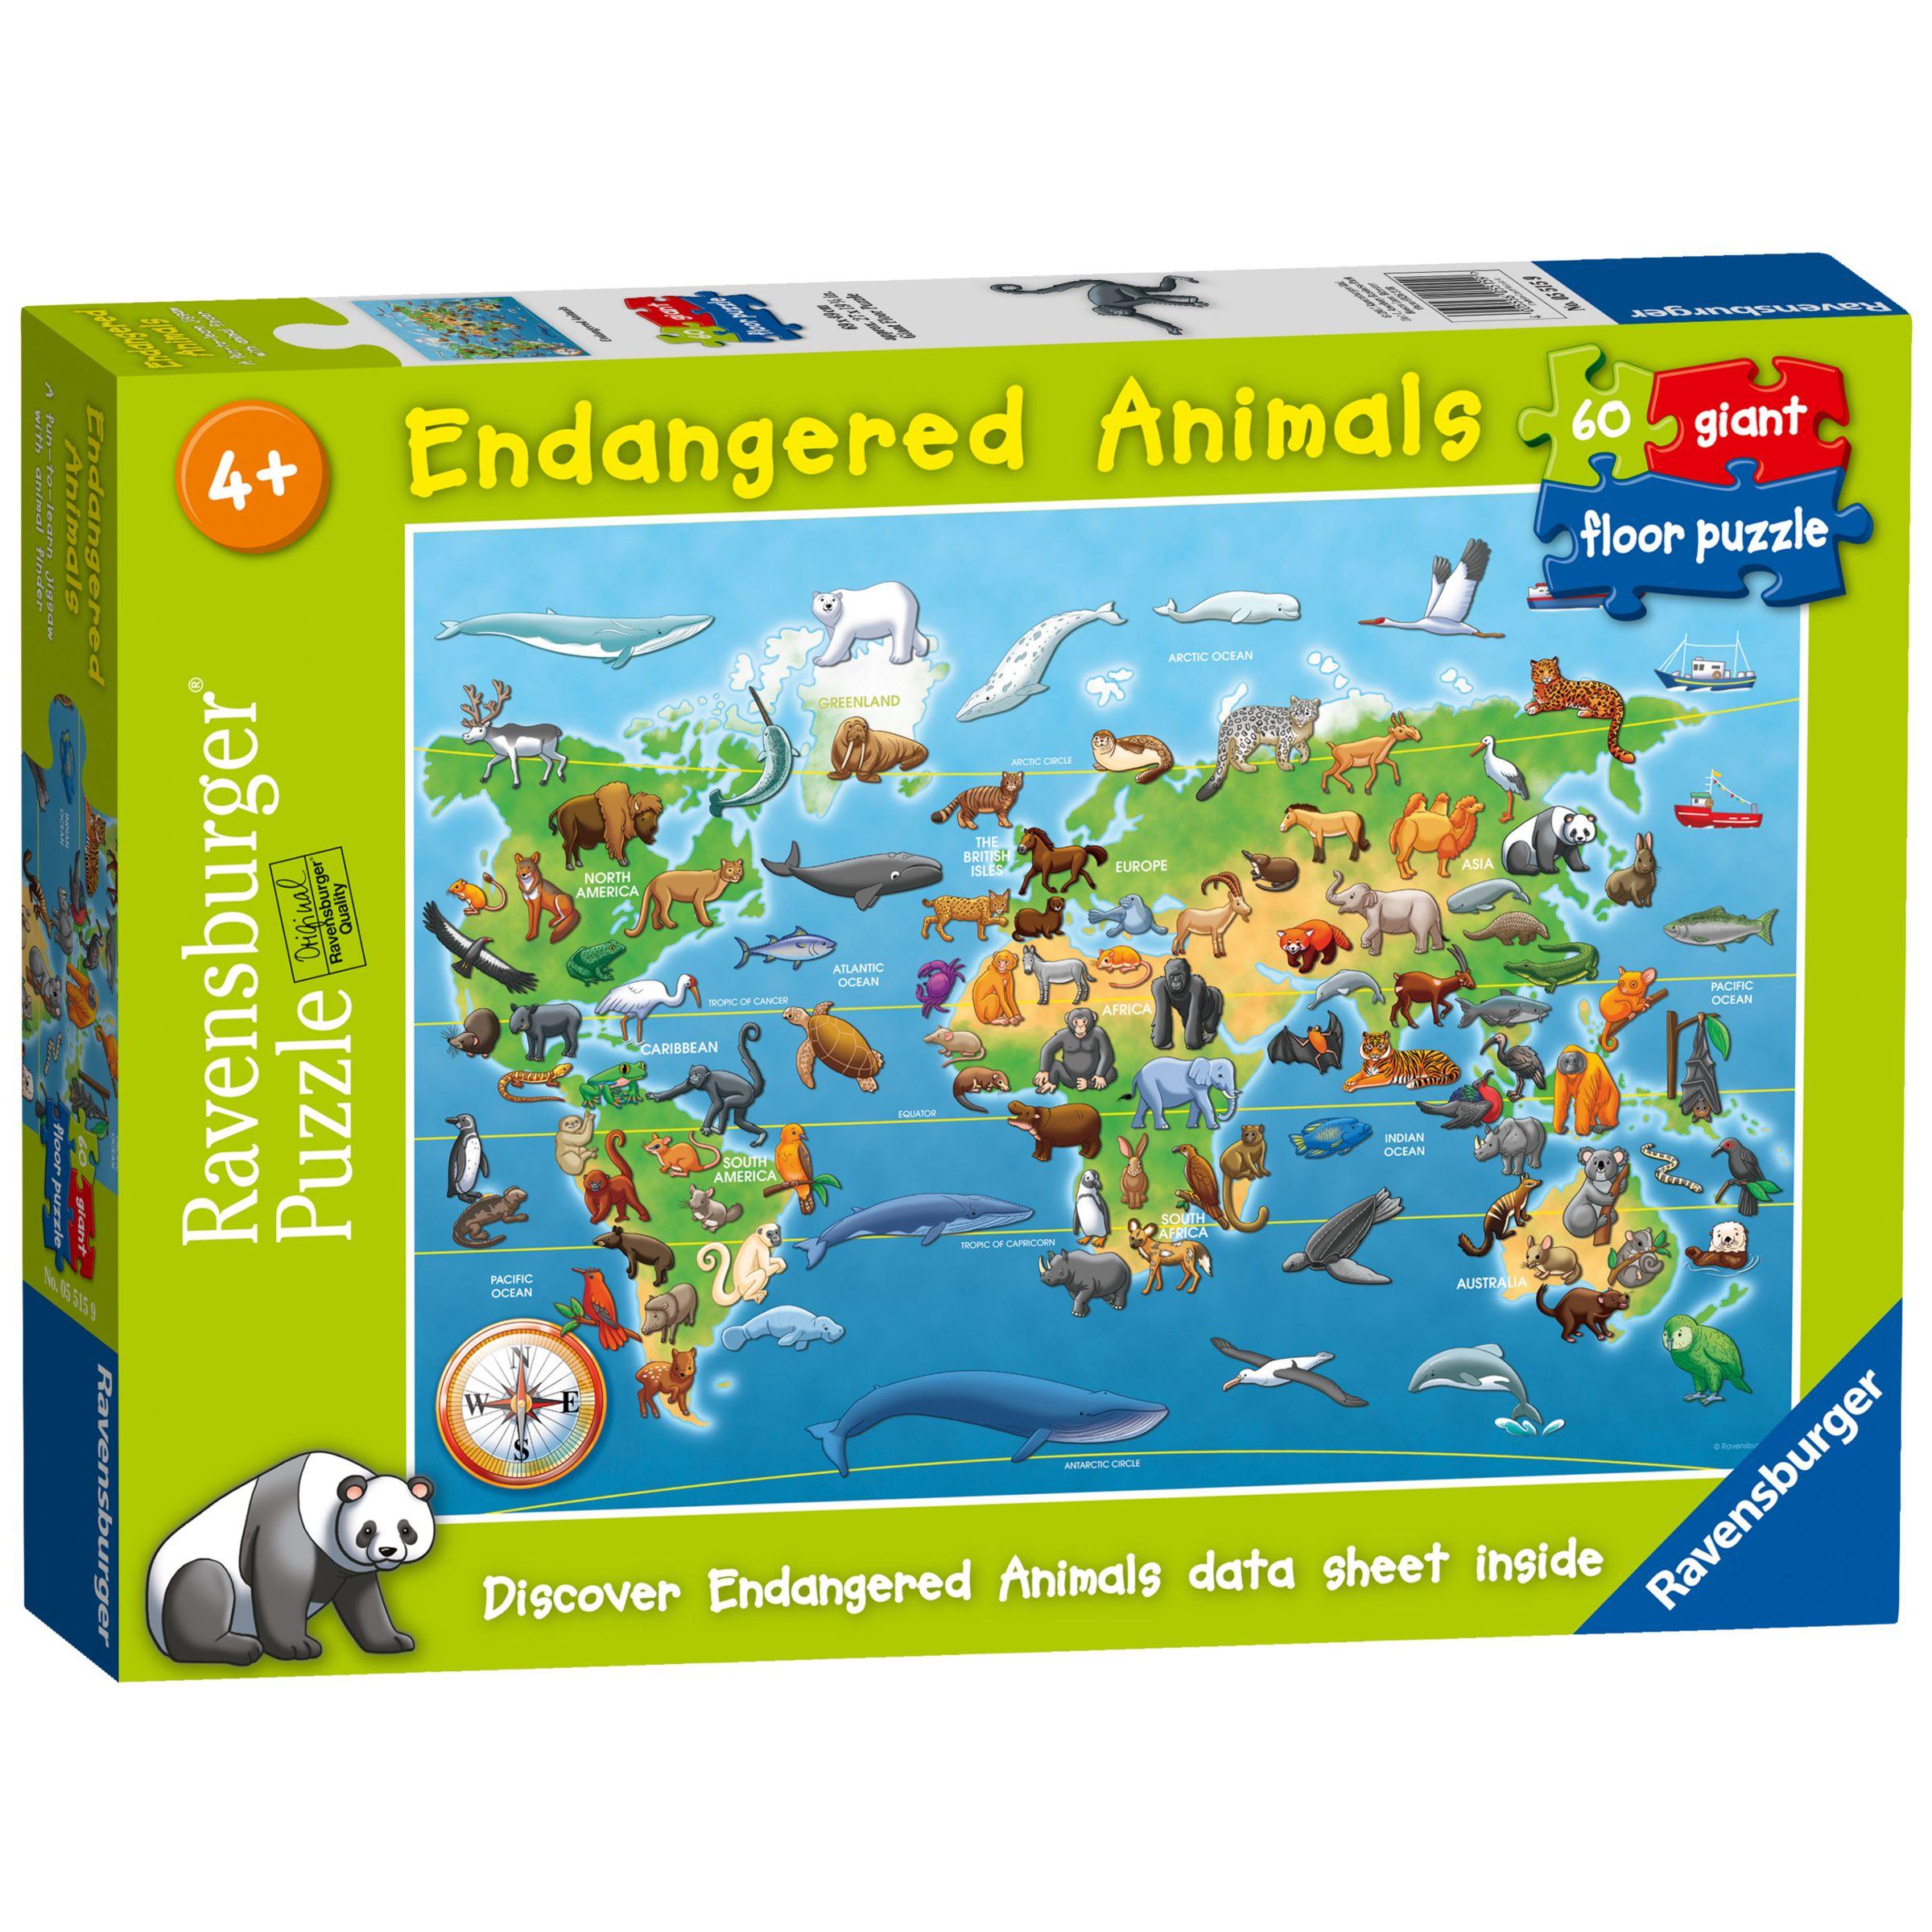 Ravensburger Ravensburger Endangered Animals Jigsaw Puzzle, 60 Pieces